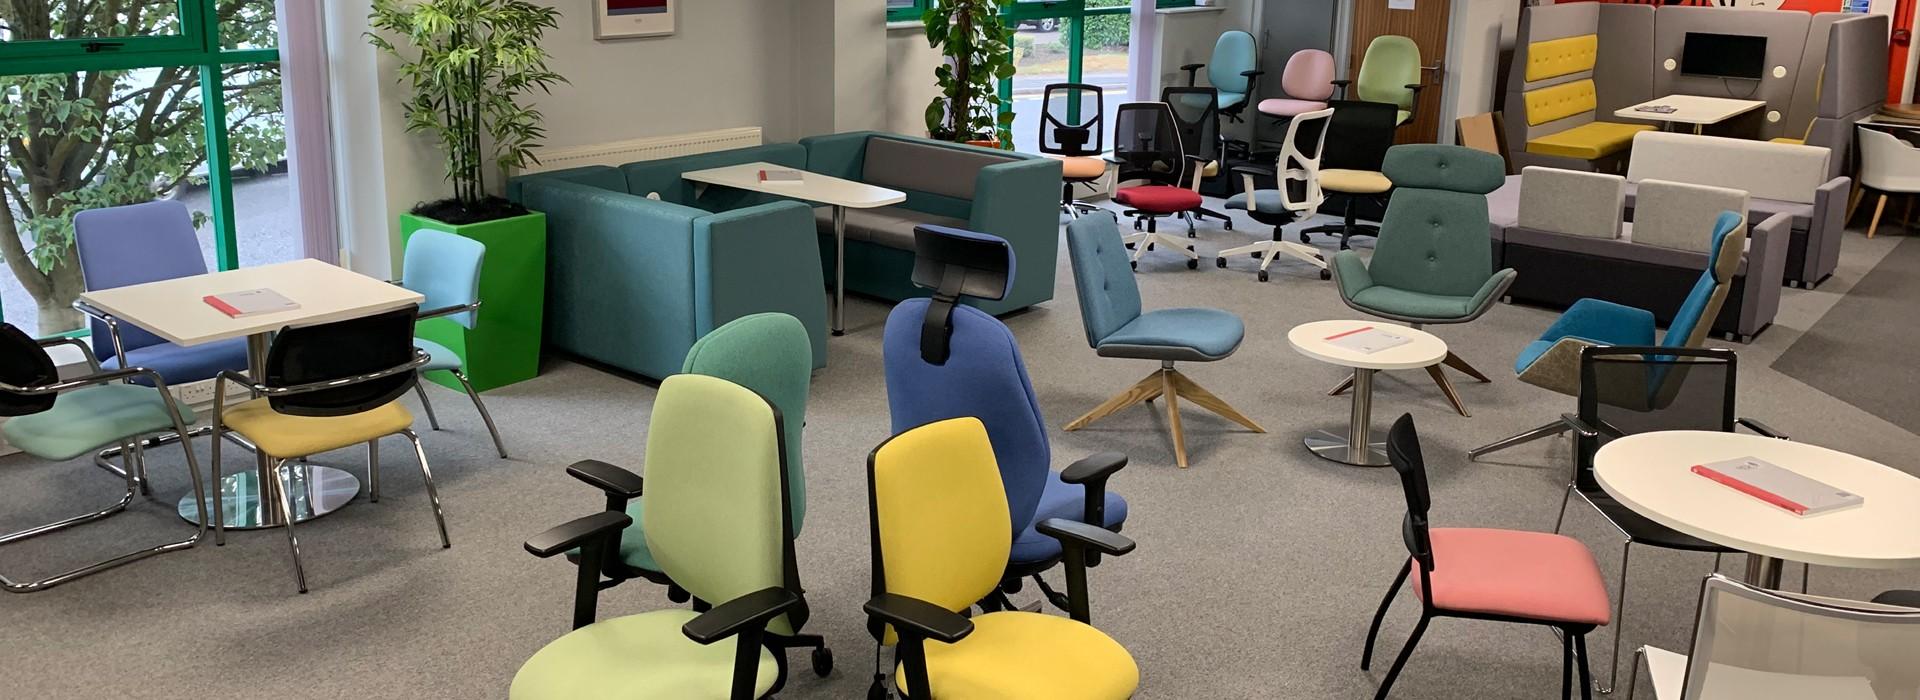 Mdk Office Seating Limited Linkedin